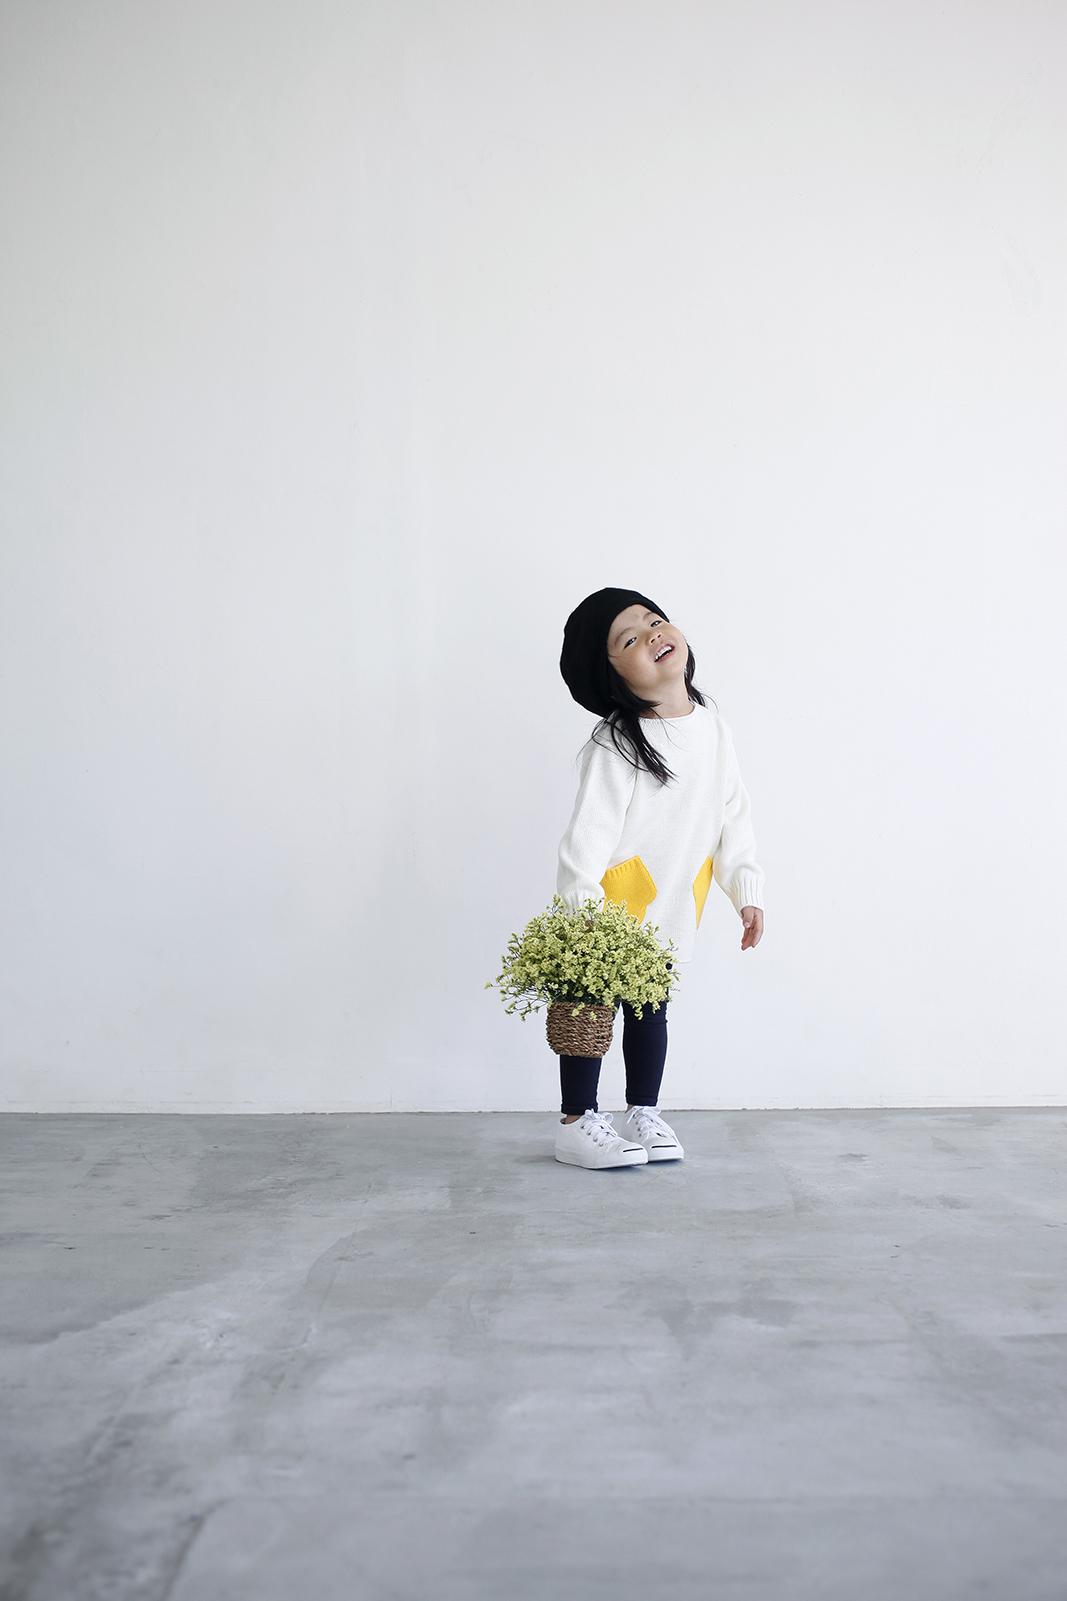 Camphor カンフル ニット knitwear kids こども 子供服 mittensweater 日本製 madeinjapan